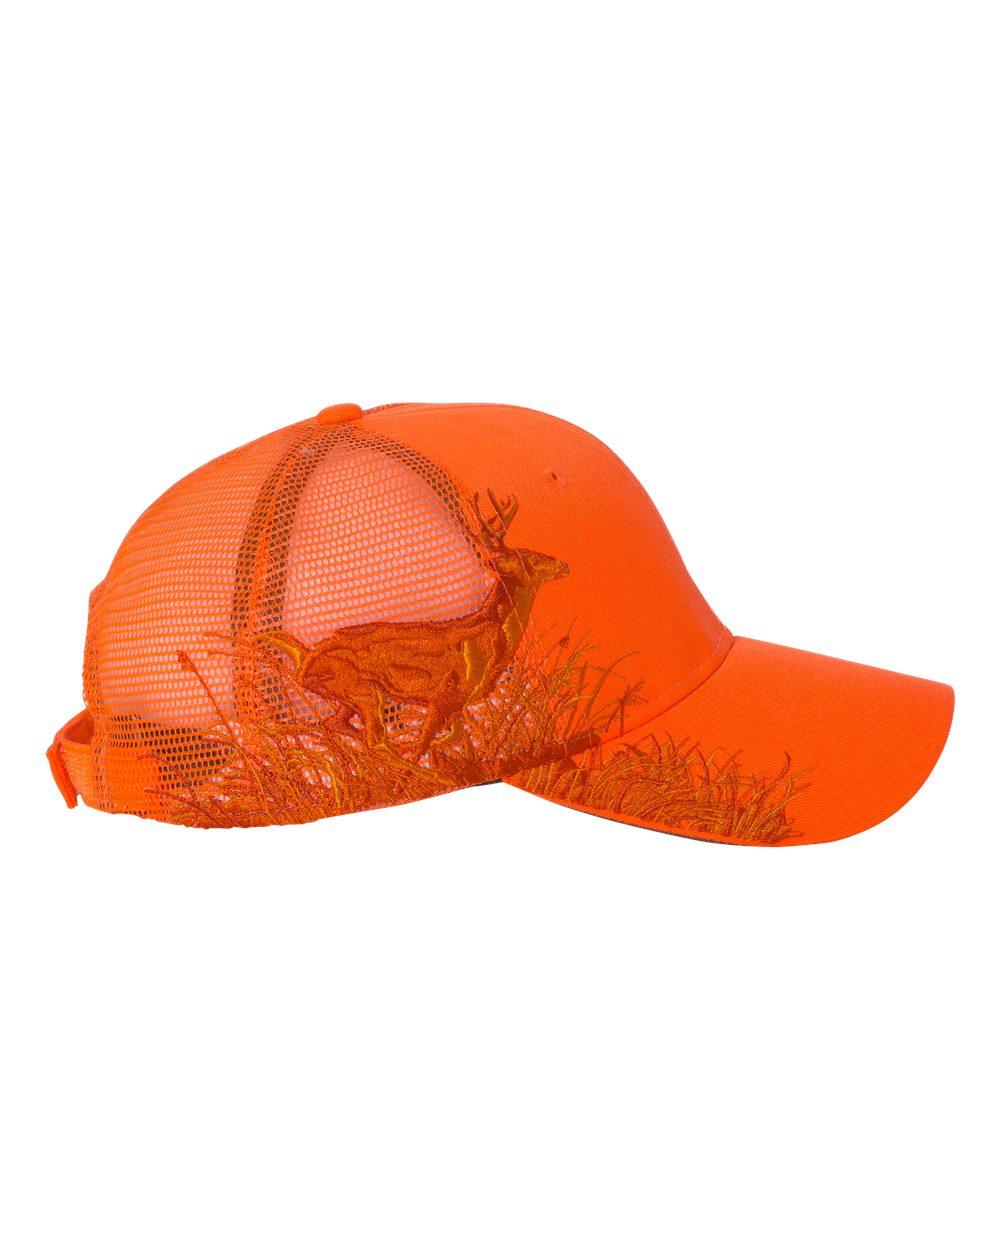 click to view Blaze Orange Mesh Back